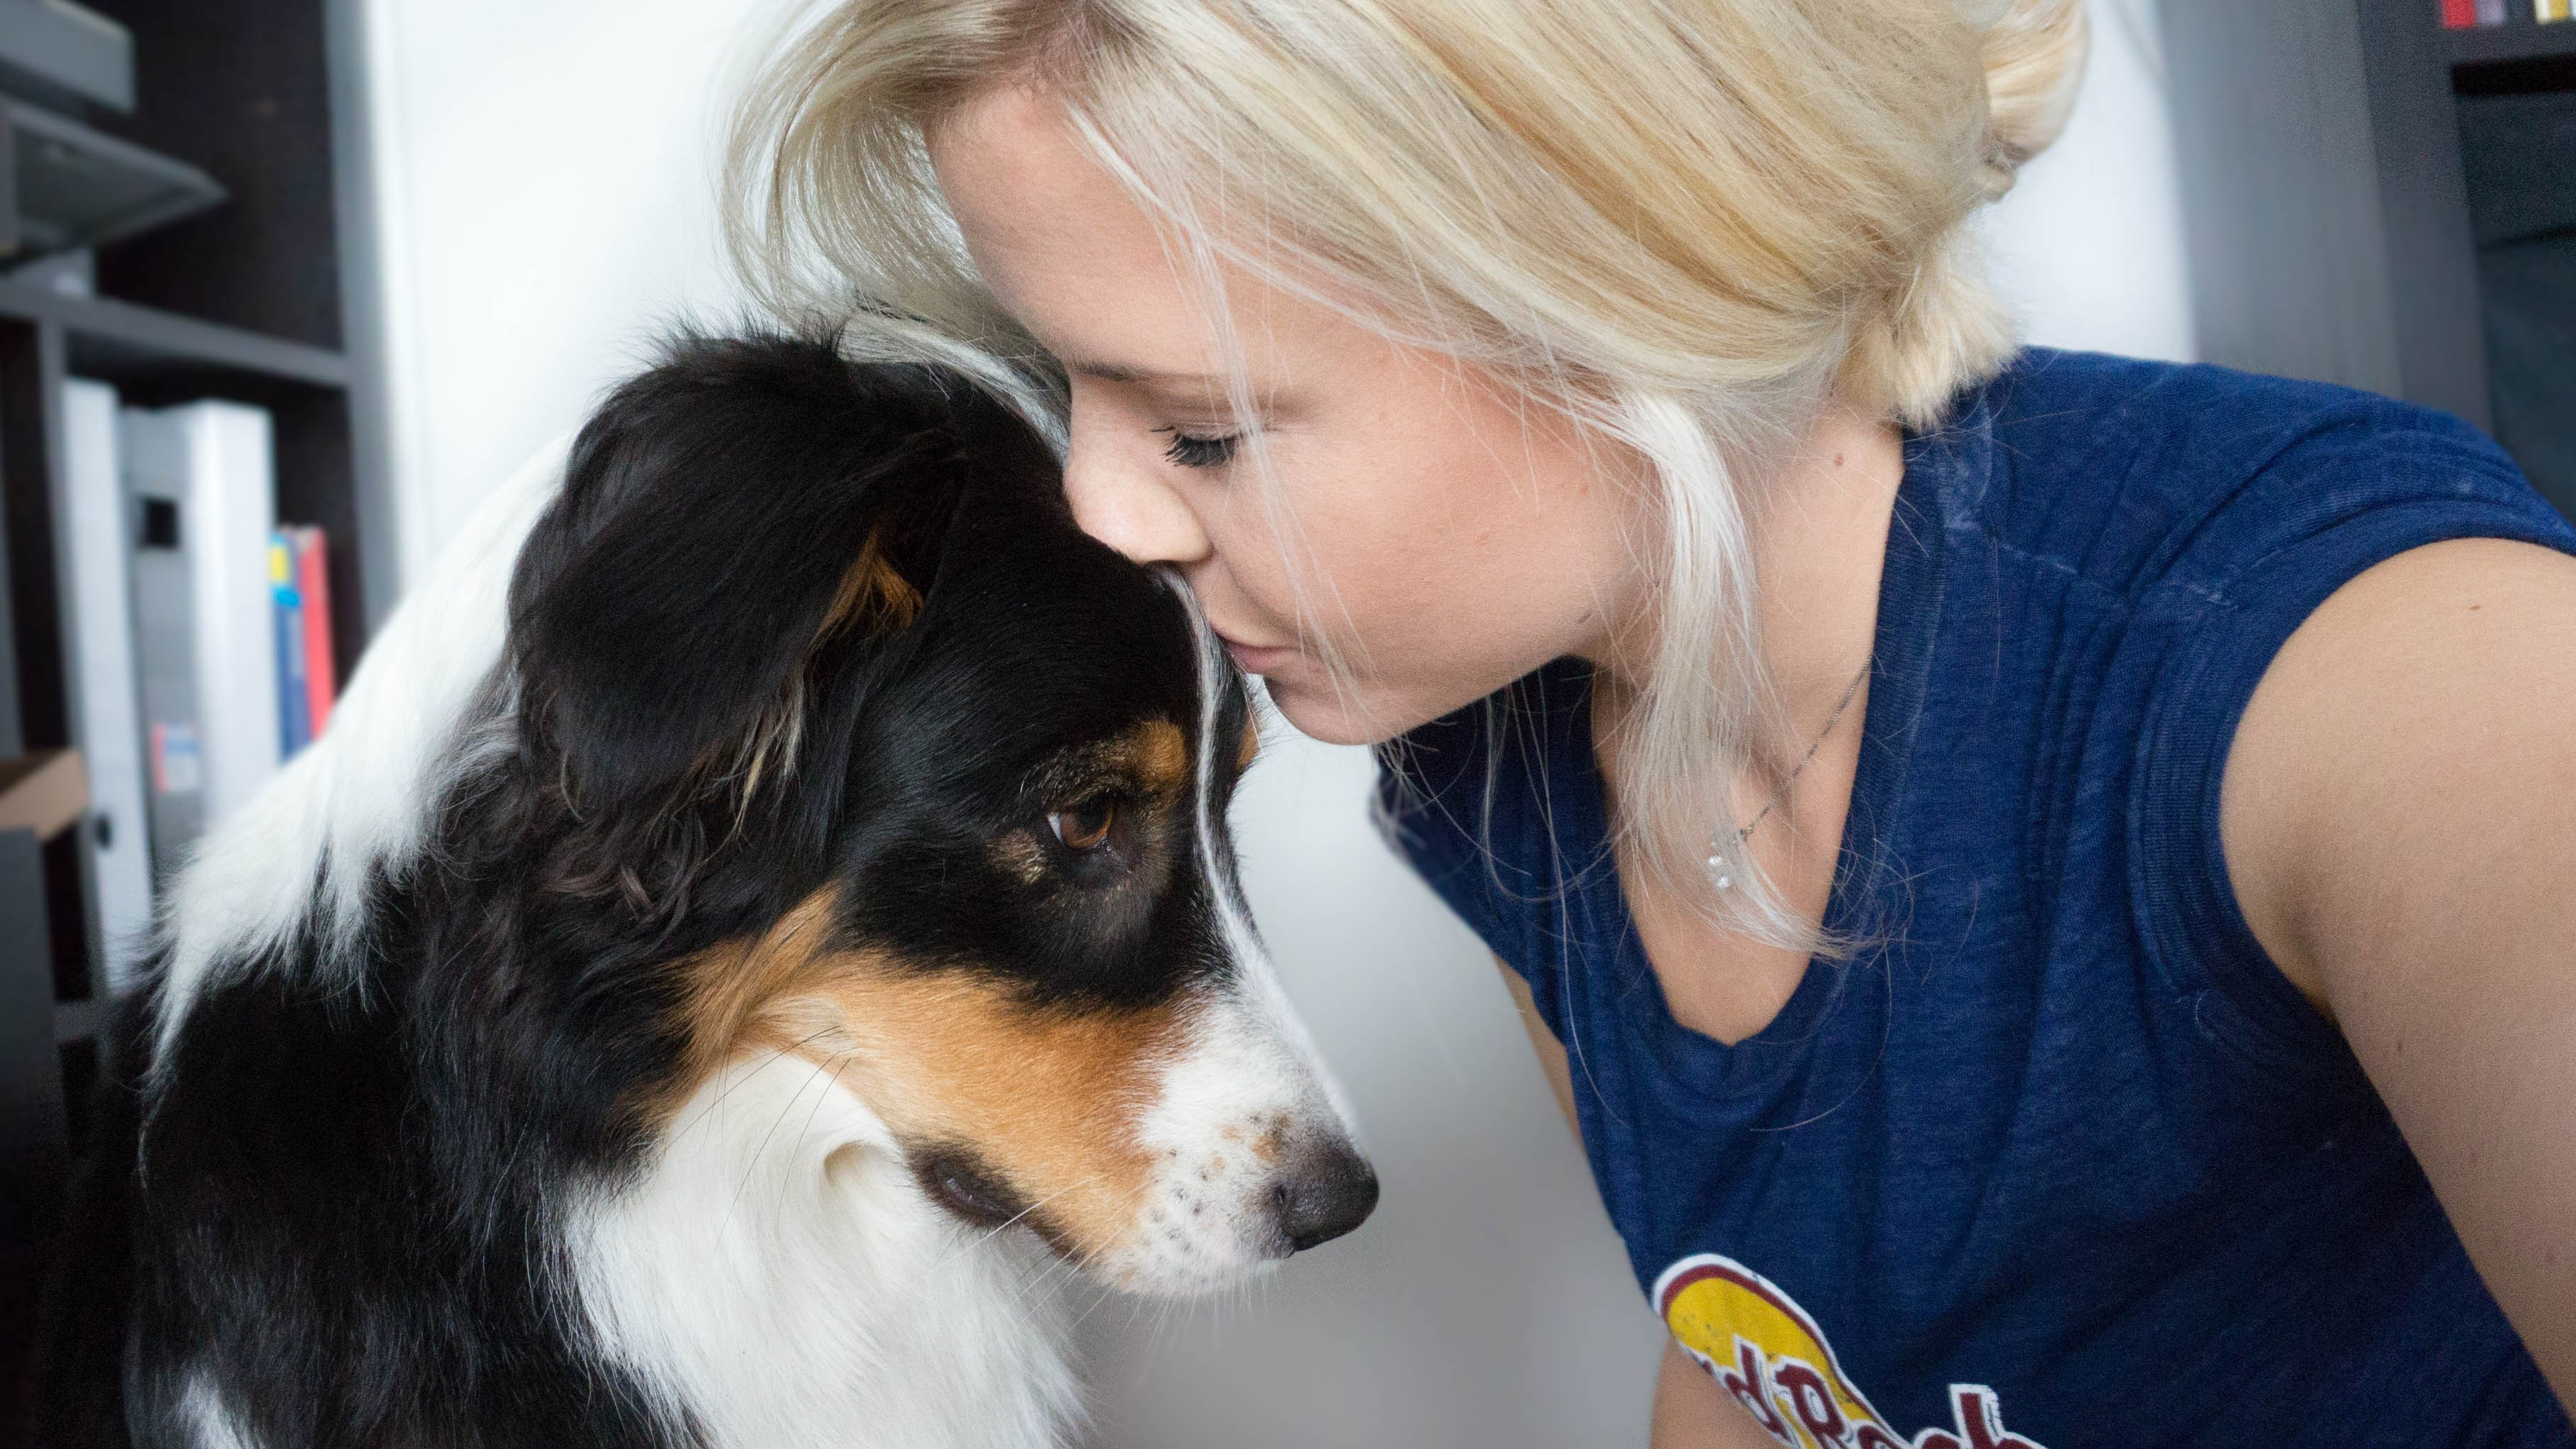 hundeblog_australian_shepherd_dogsoulmate_2